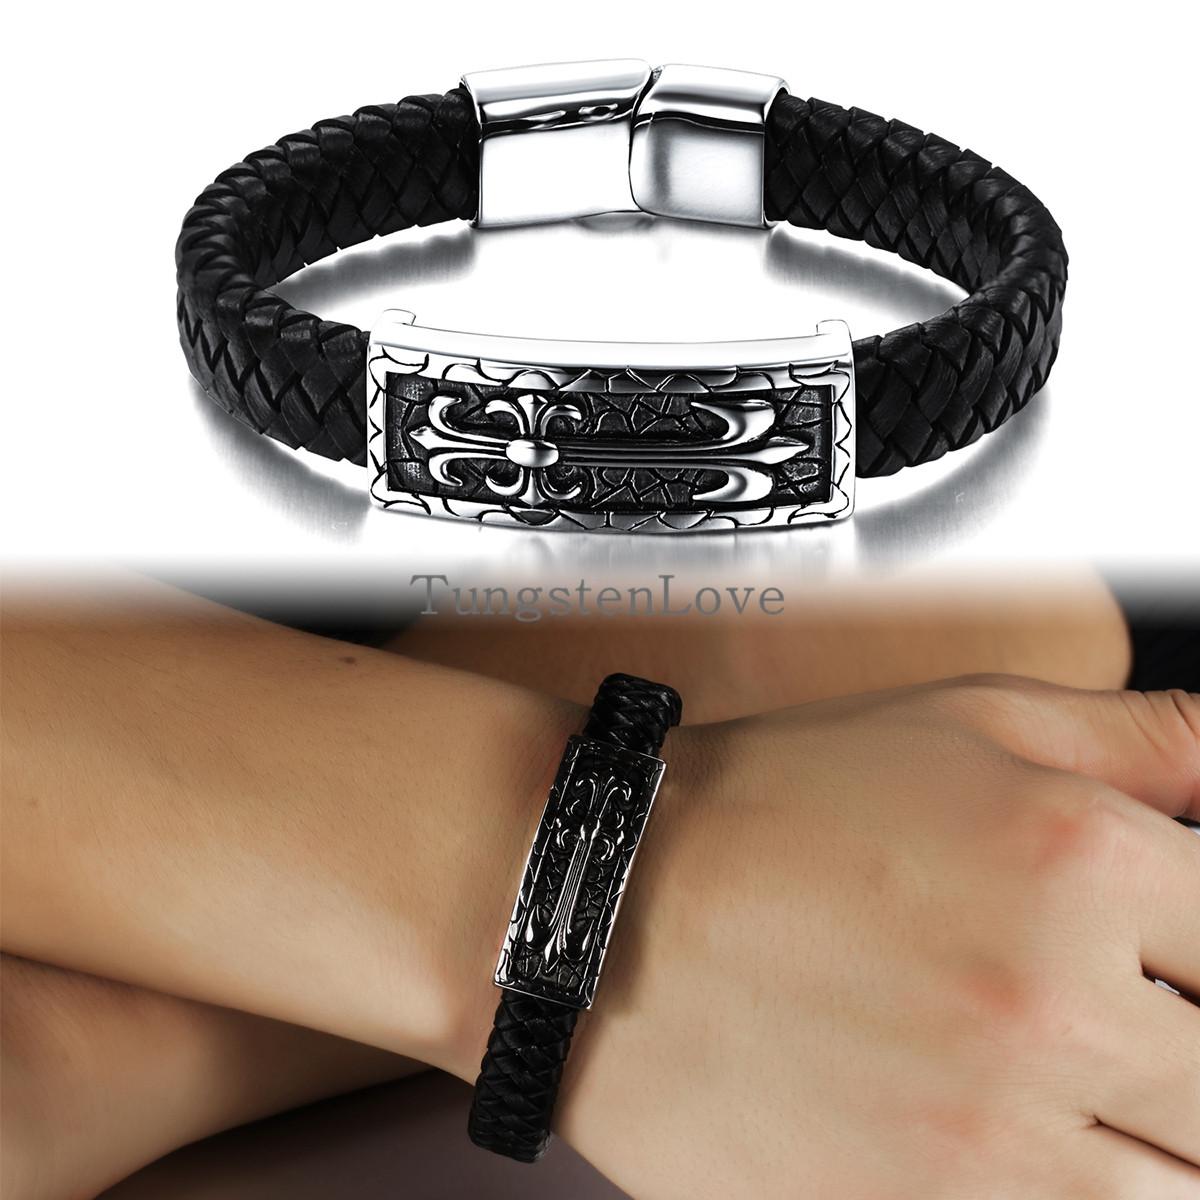 22.5cm Men Jewelry Vintage Style French fleur de lis Leather Rope Bracelet For Men Fashion Wristband masculina pulseira de couro(China (Mainland))